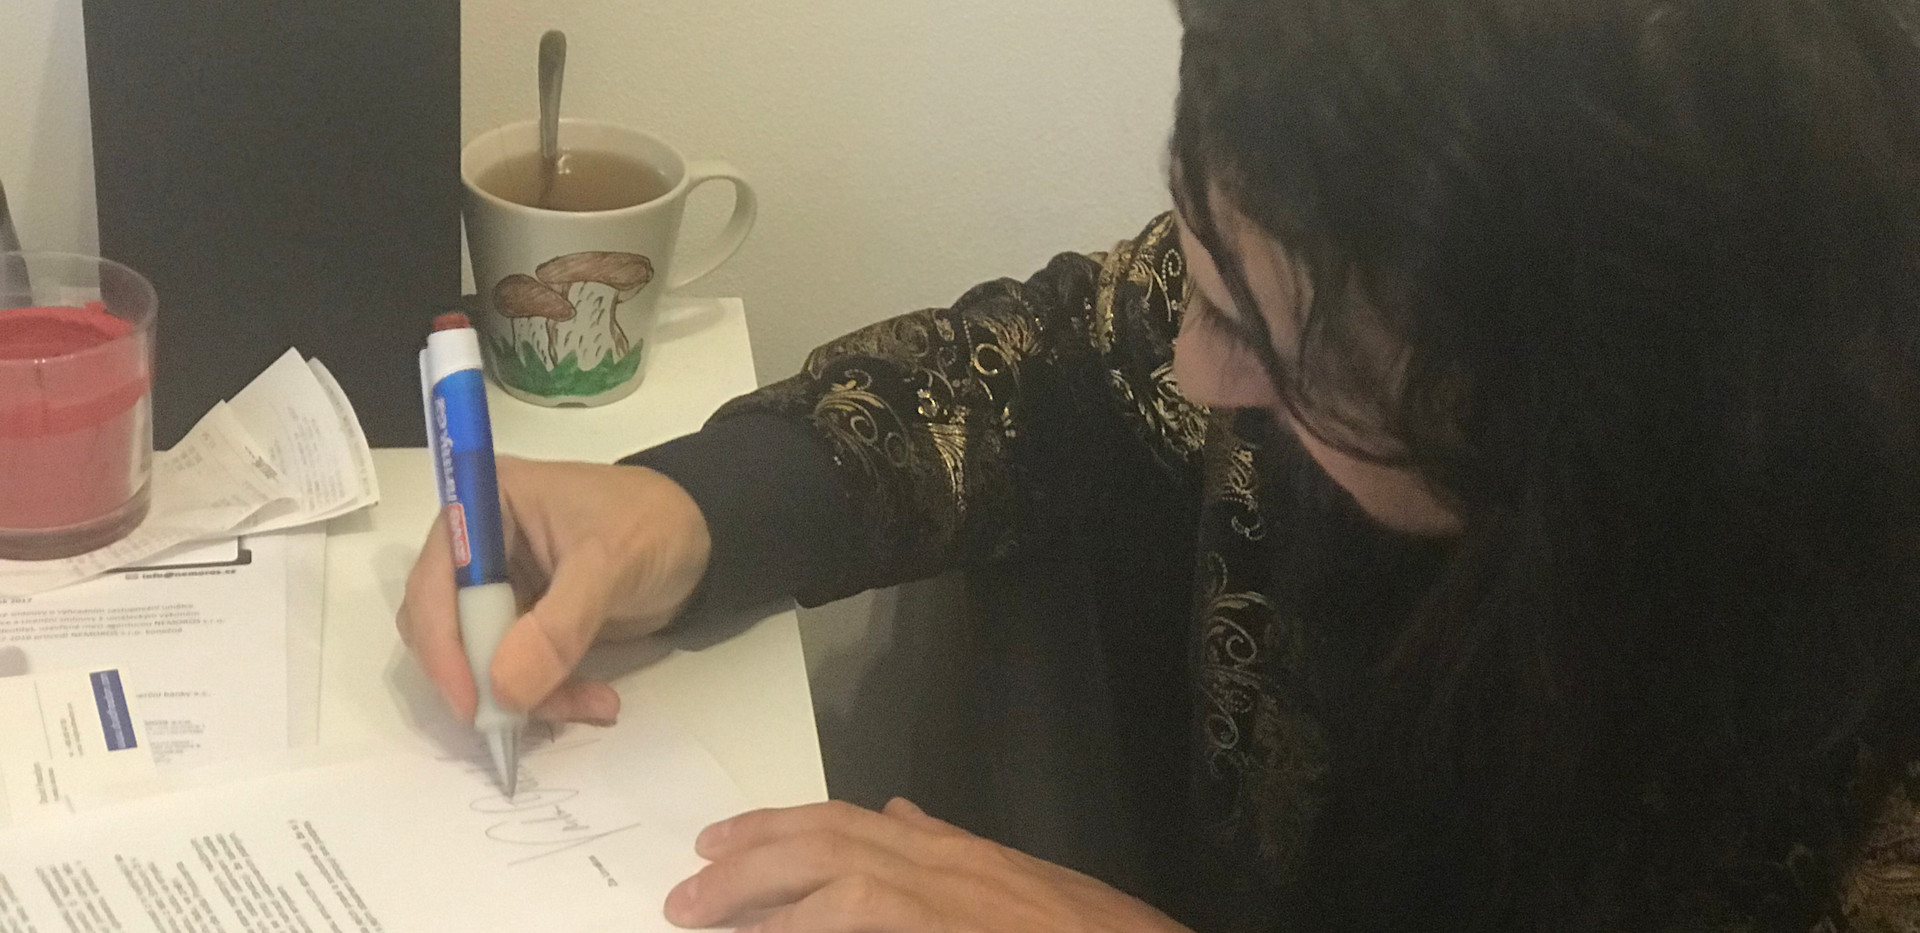 Varhan podepsal smlouvu na Publishing